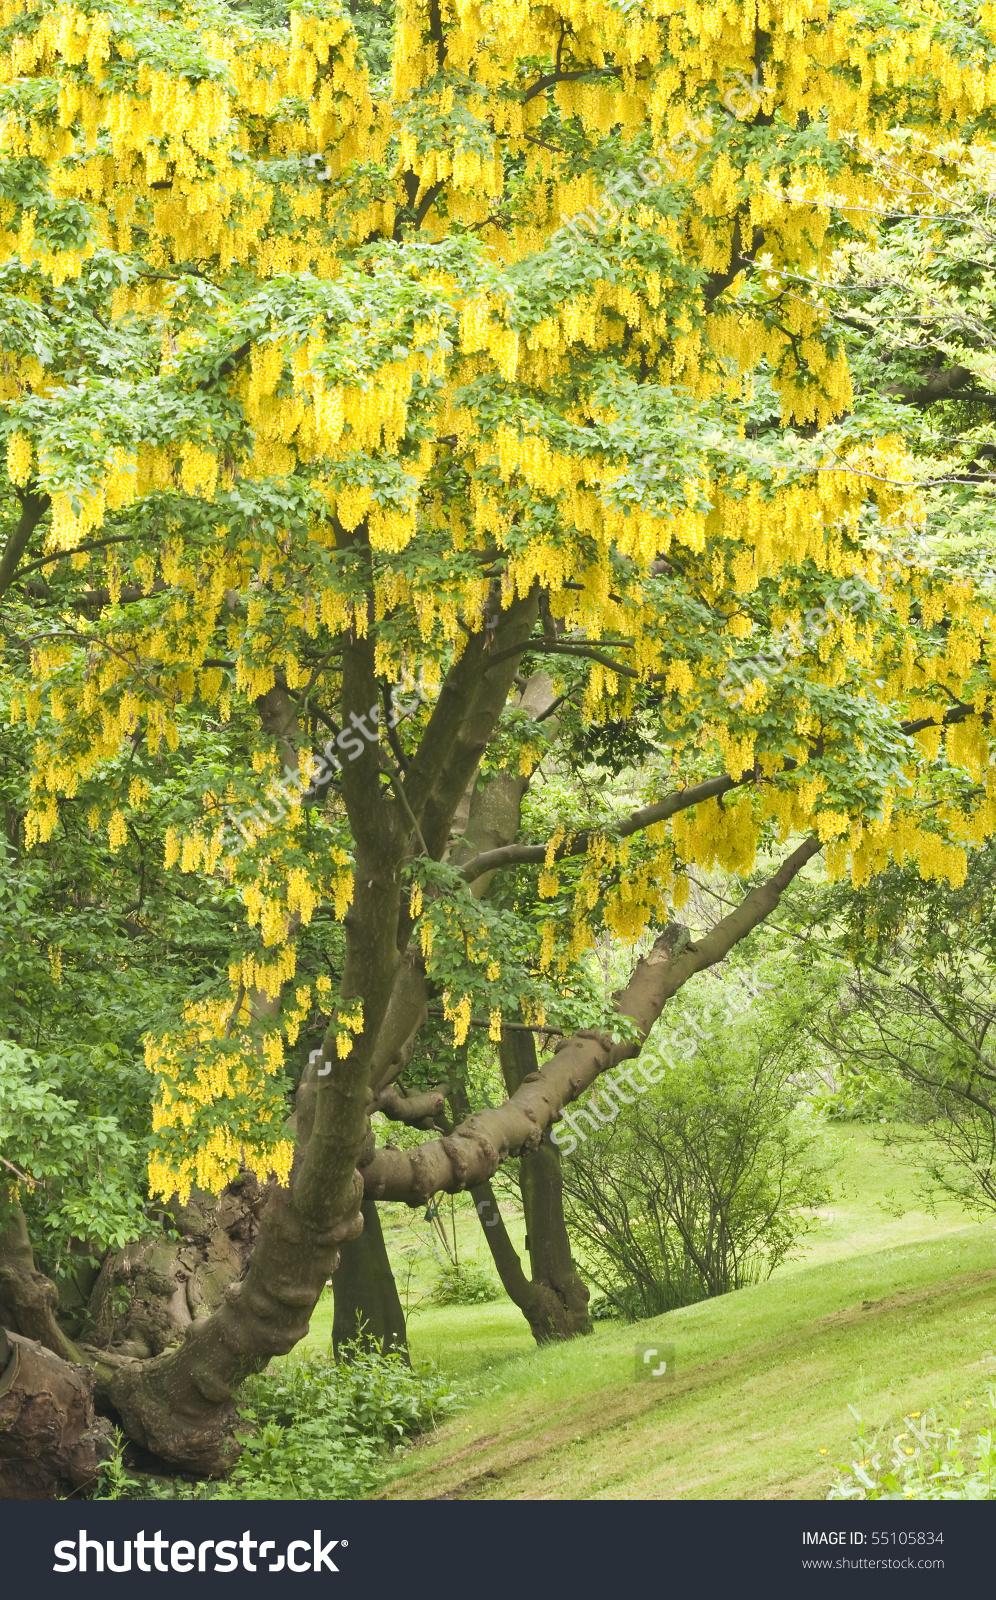 Laburnum Anagyroides, Common Laburnum Tree With Yellow Flowers.